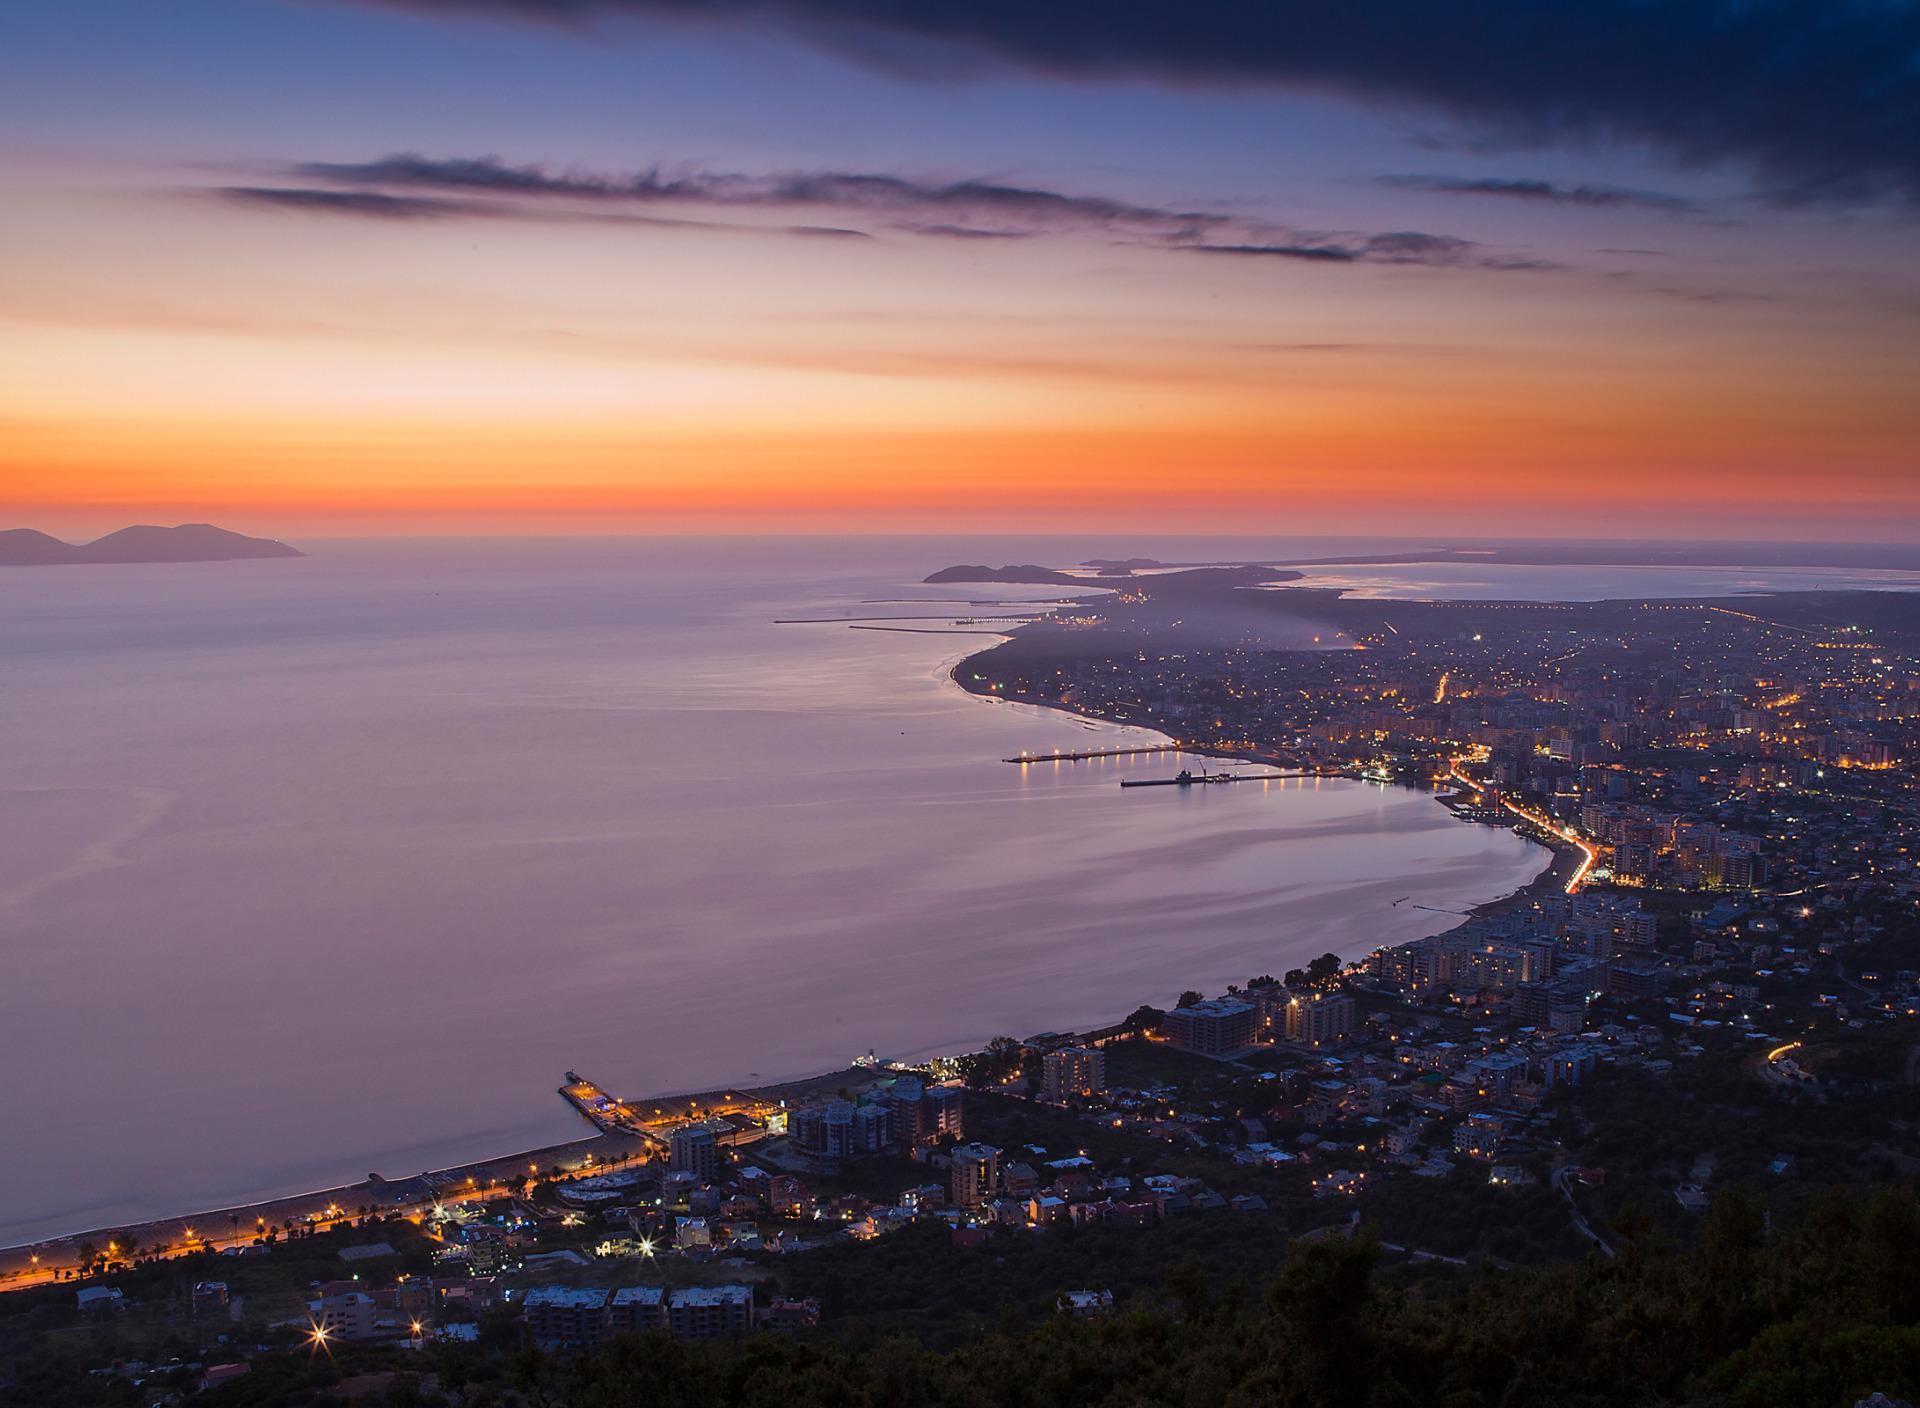 огни город море сумерки lights the city sea twilight  № 2659490 бесплатно